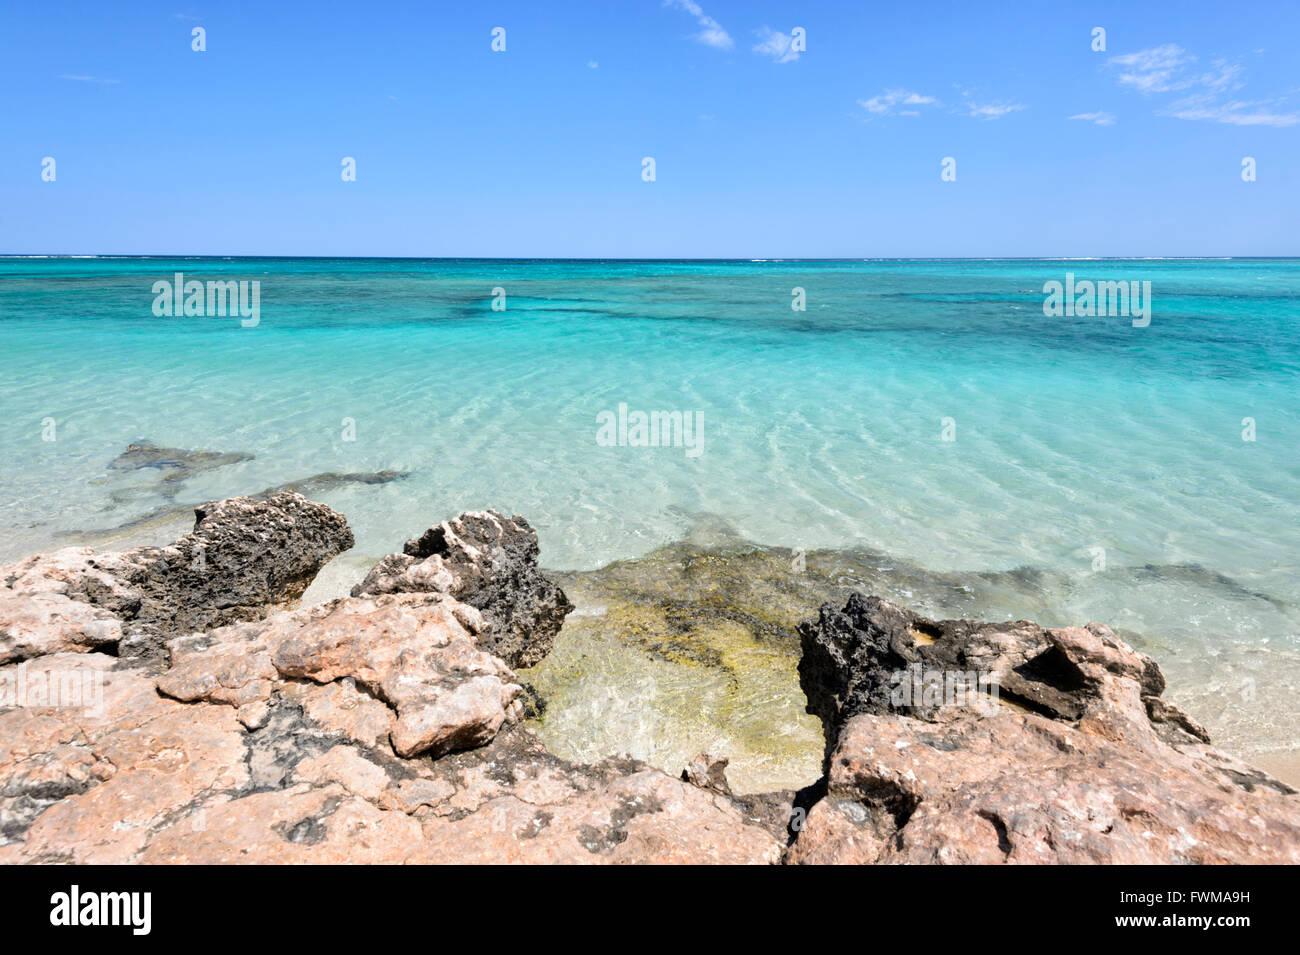 Ningaloo Coast, World Heritage, Western Australia, Australia - Stock Image